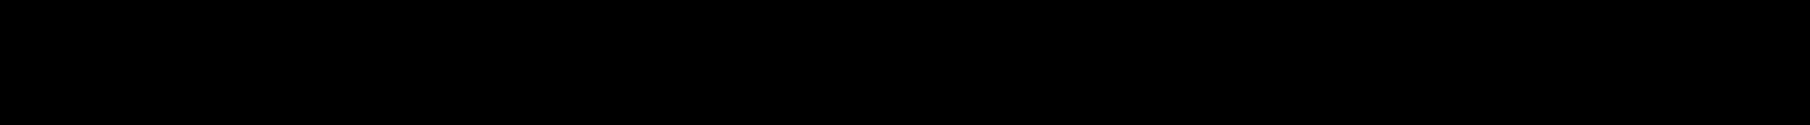 2020-03-27_crew_Datenmodell